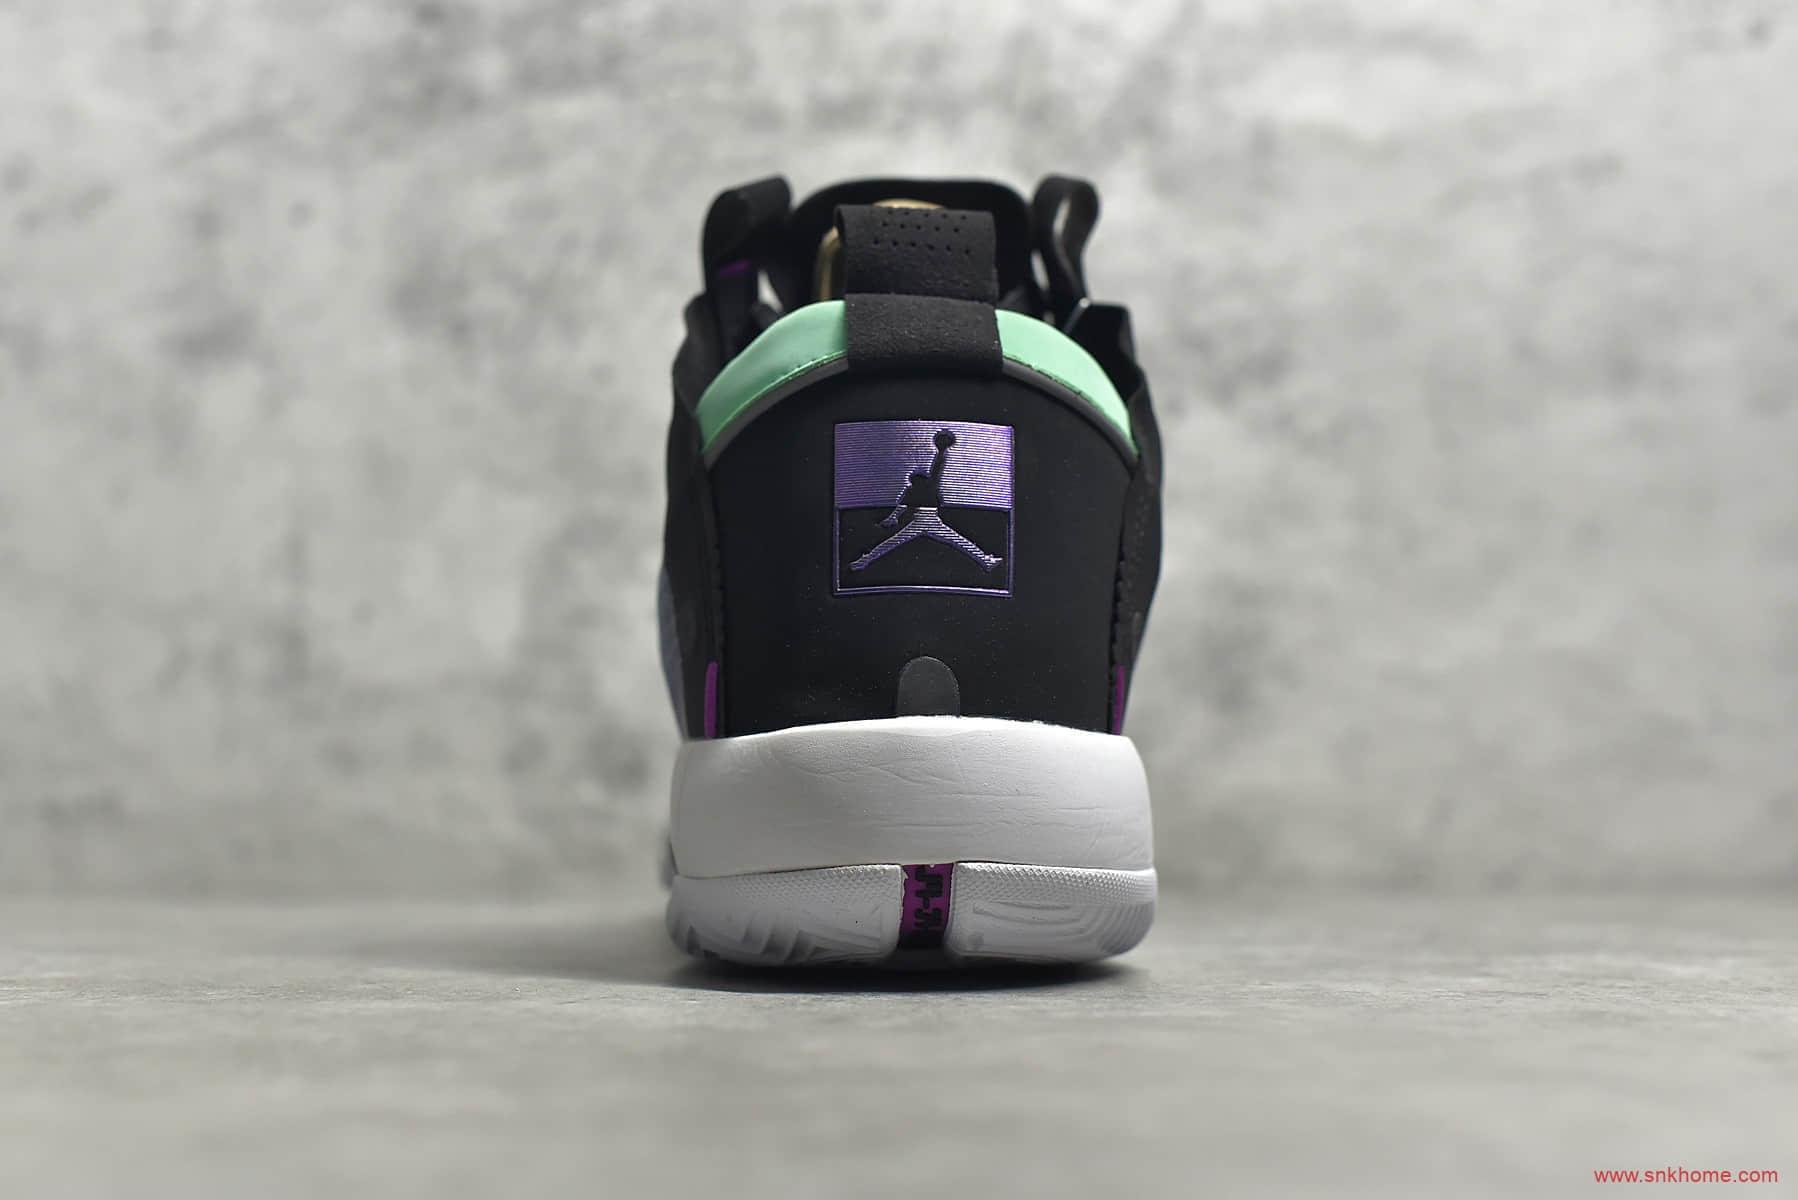 AJ34电光蓝实战篮球鞋 AJ13 BLUE VOID莆田灭世纯原版本AJ34货源 货号:BQ3381-400-潮流者之家